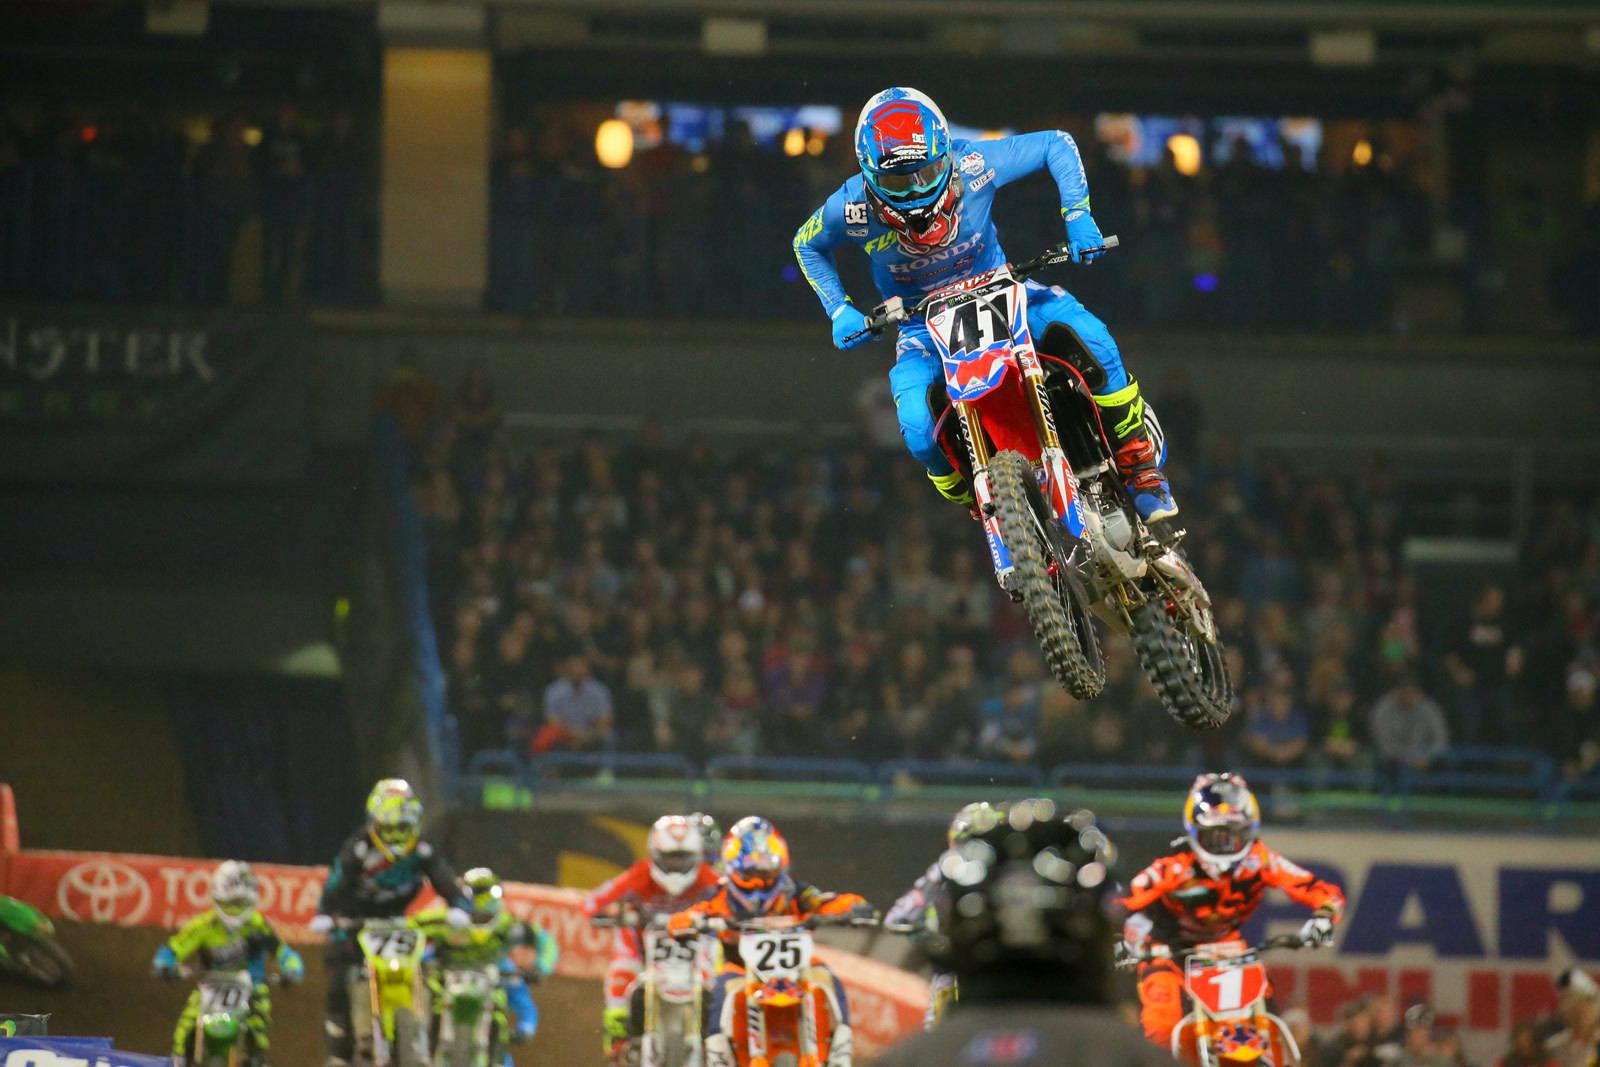 Trey Canard - Photo Blast: Toronto - Motocross Pictures - Vital MX